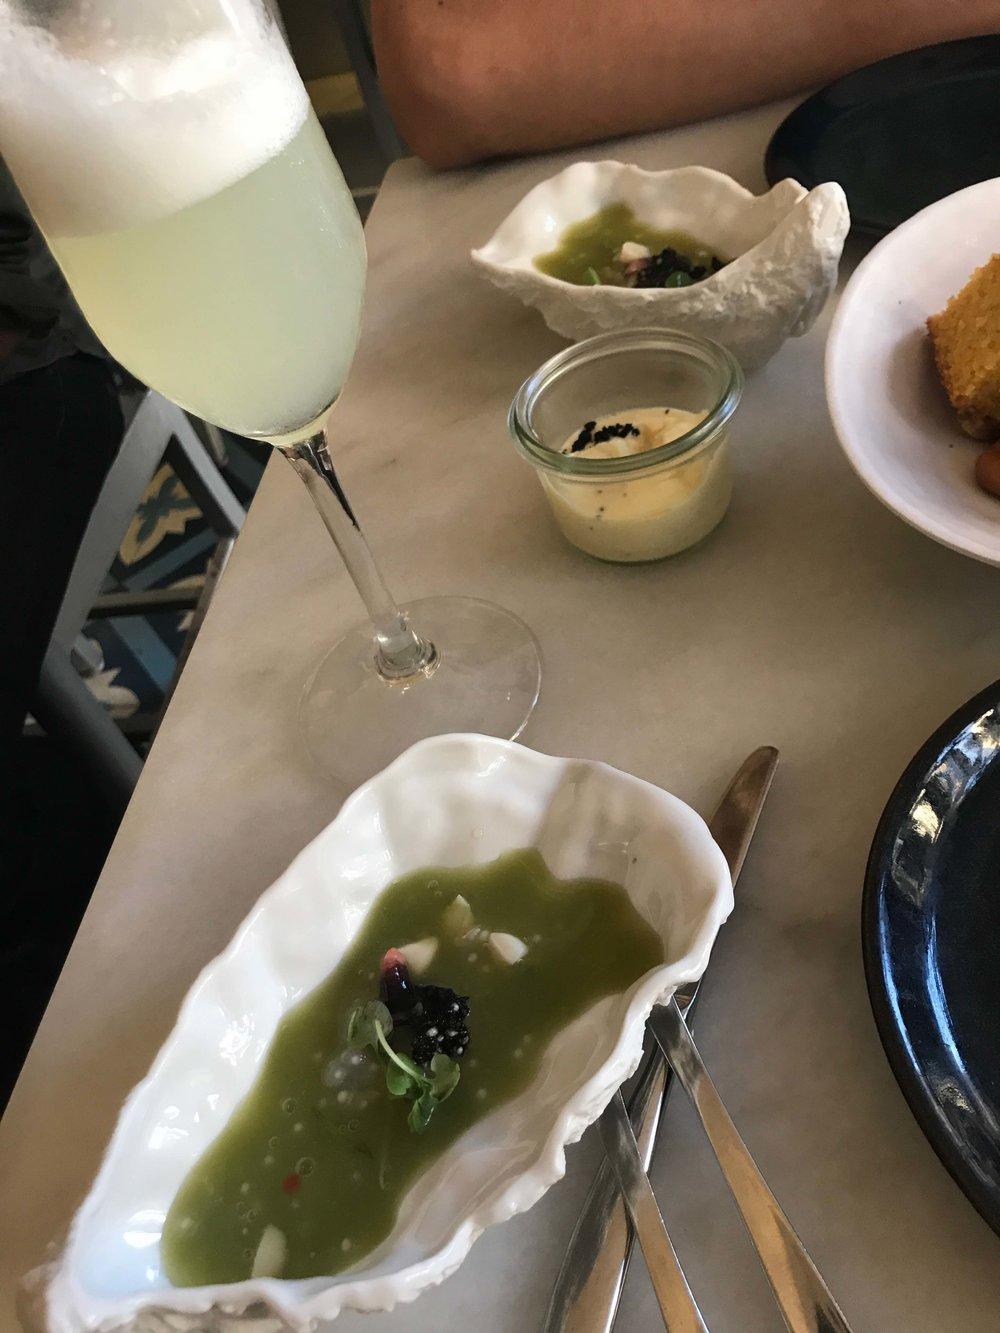 #othalo #lissabon #portugal #disawistories #chefkiko #piscosauer.jpg